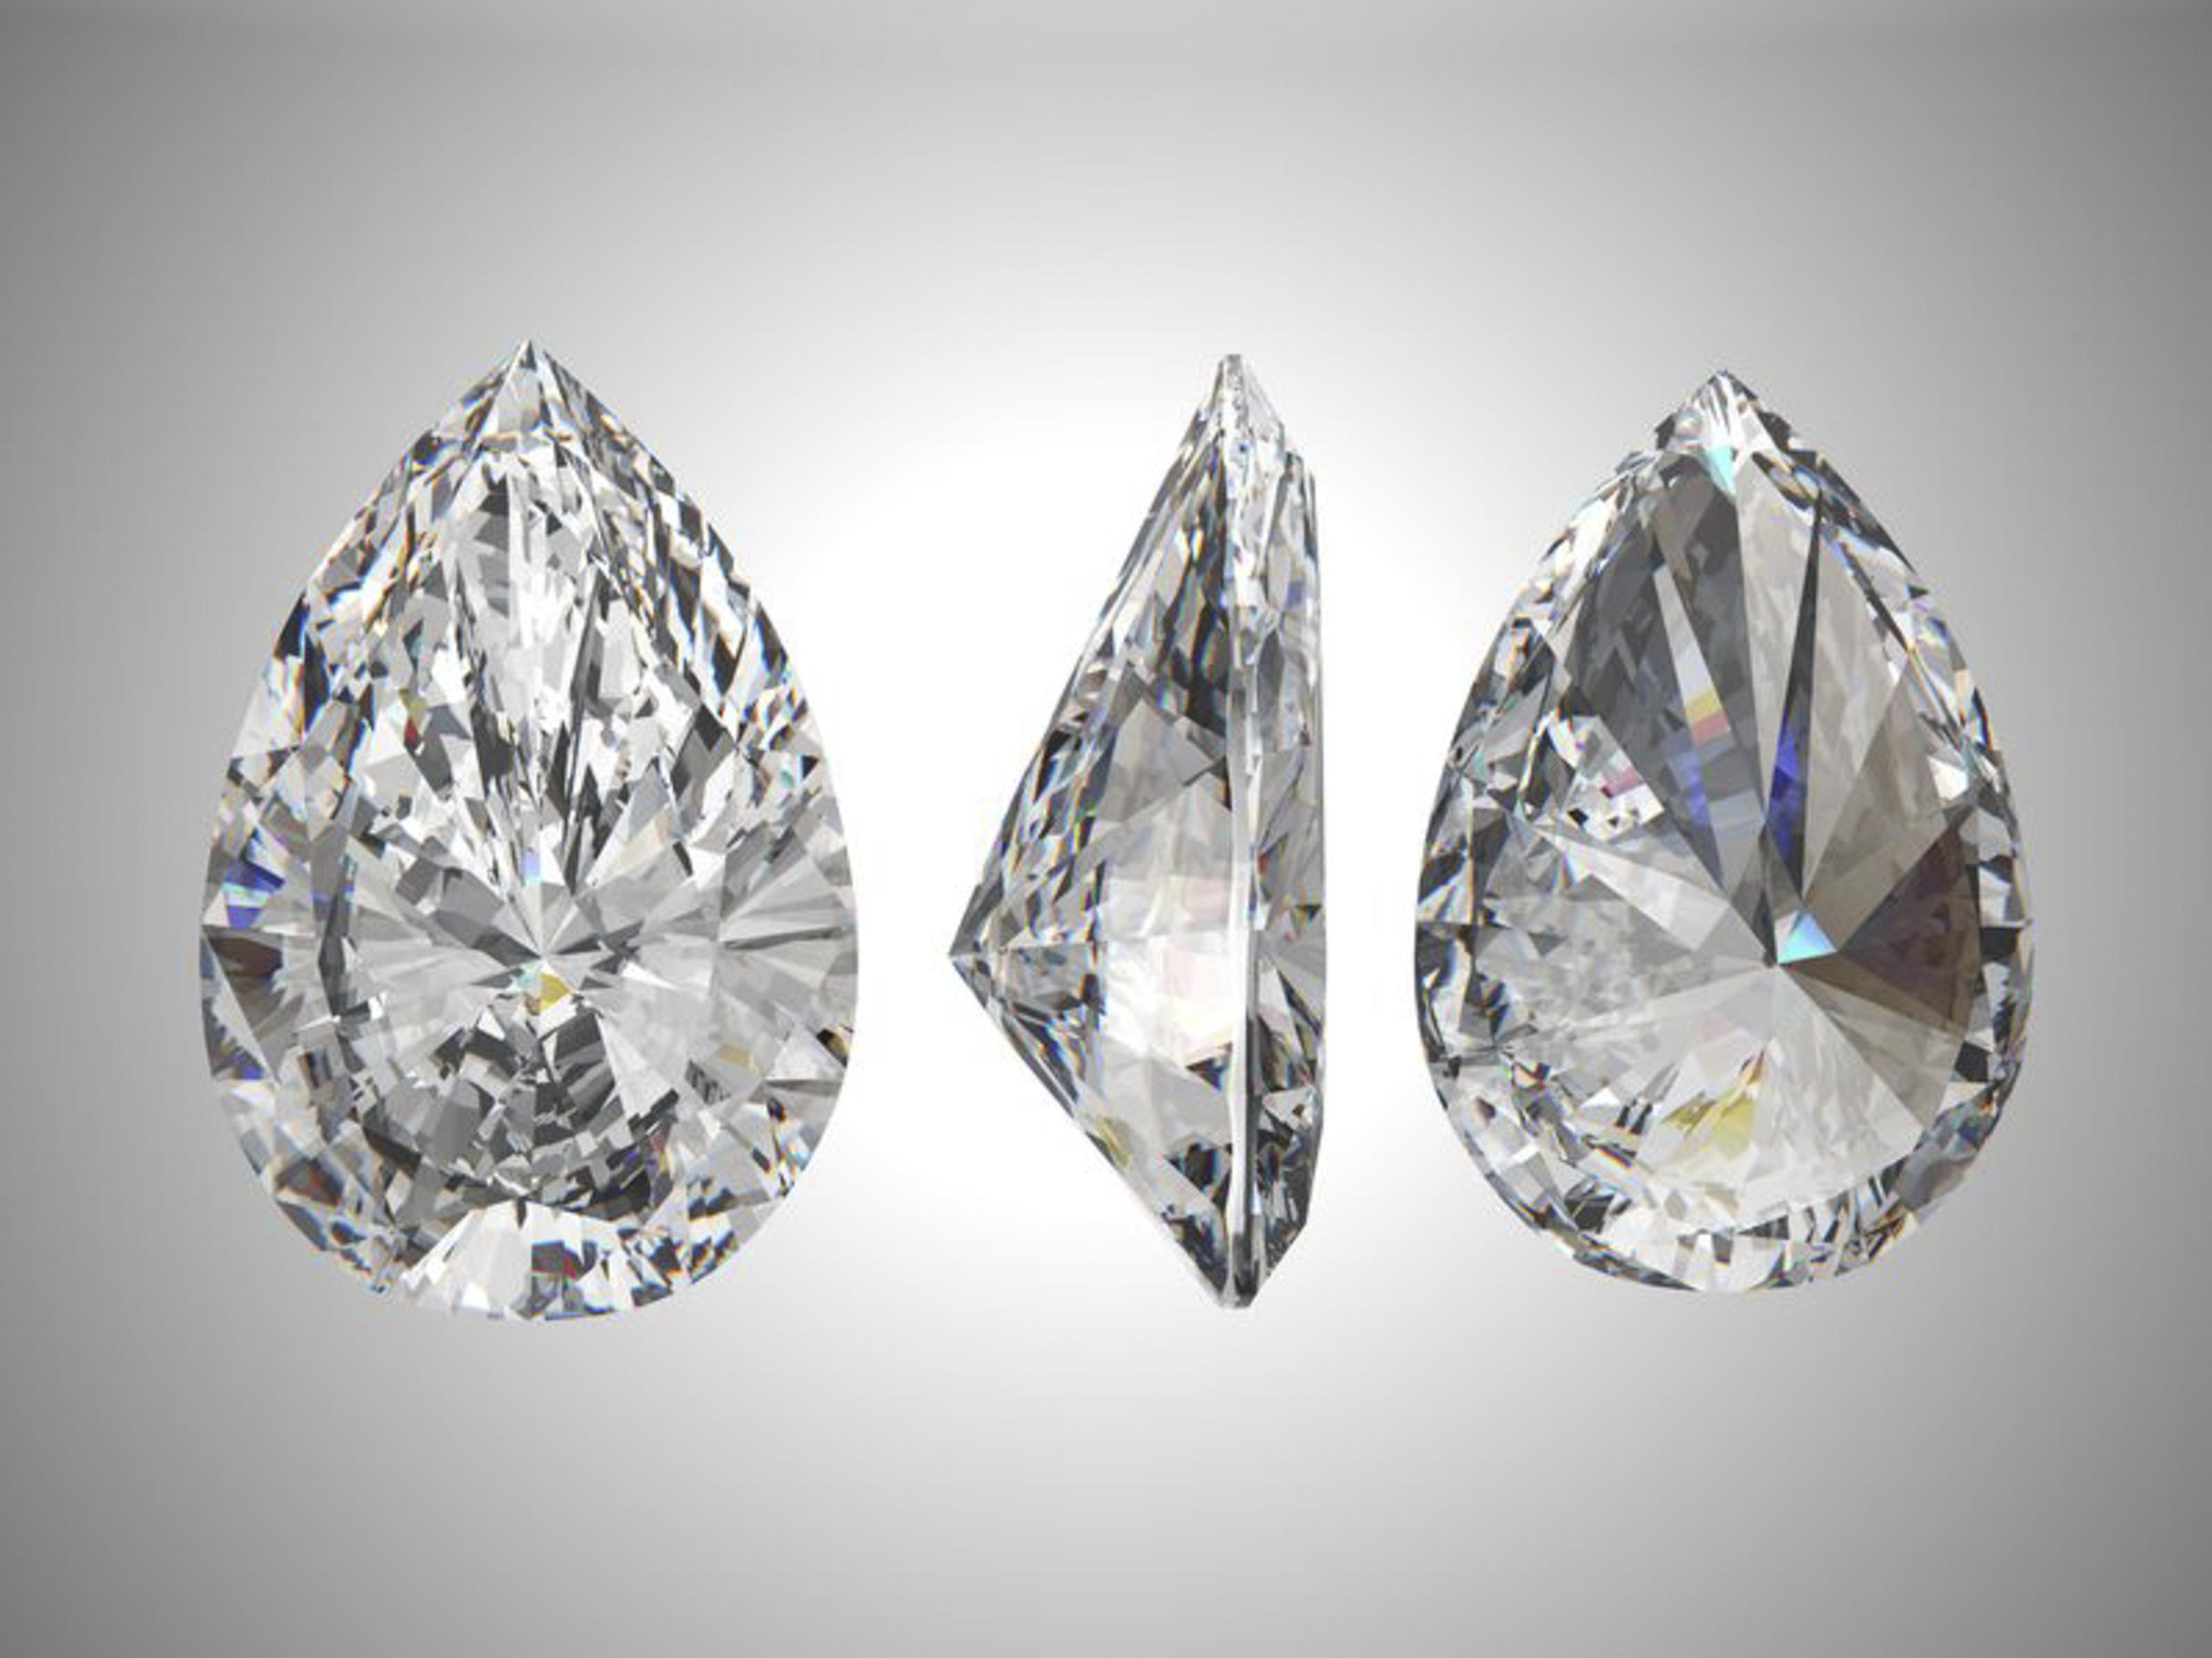 Takara lab created diamonds - worlds purest, ideal cut